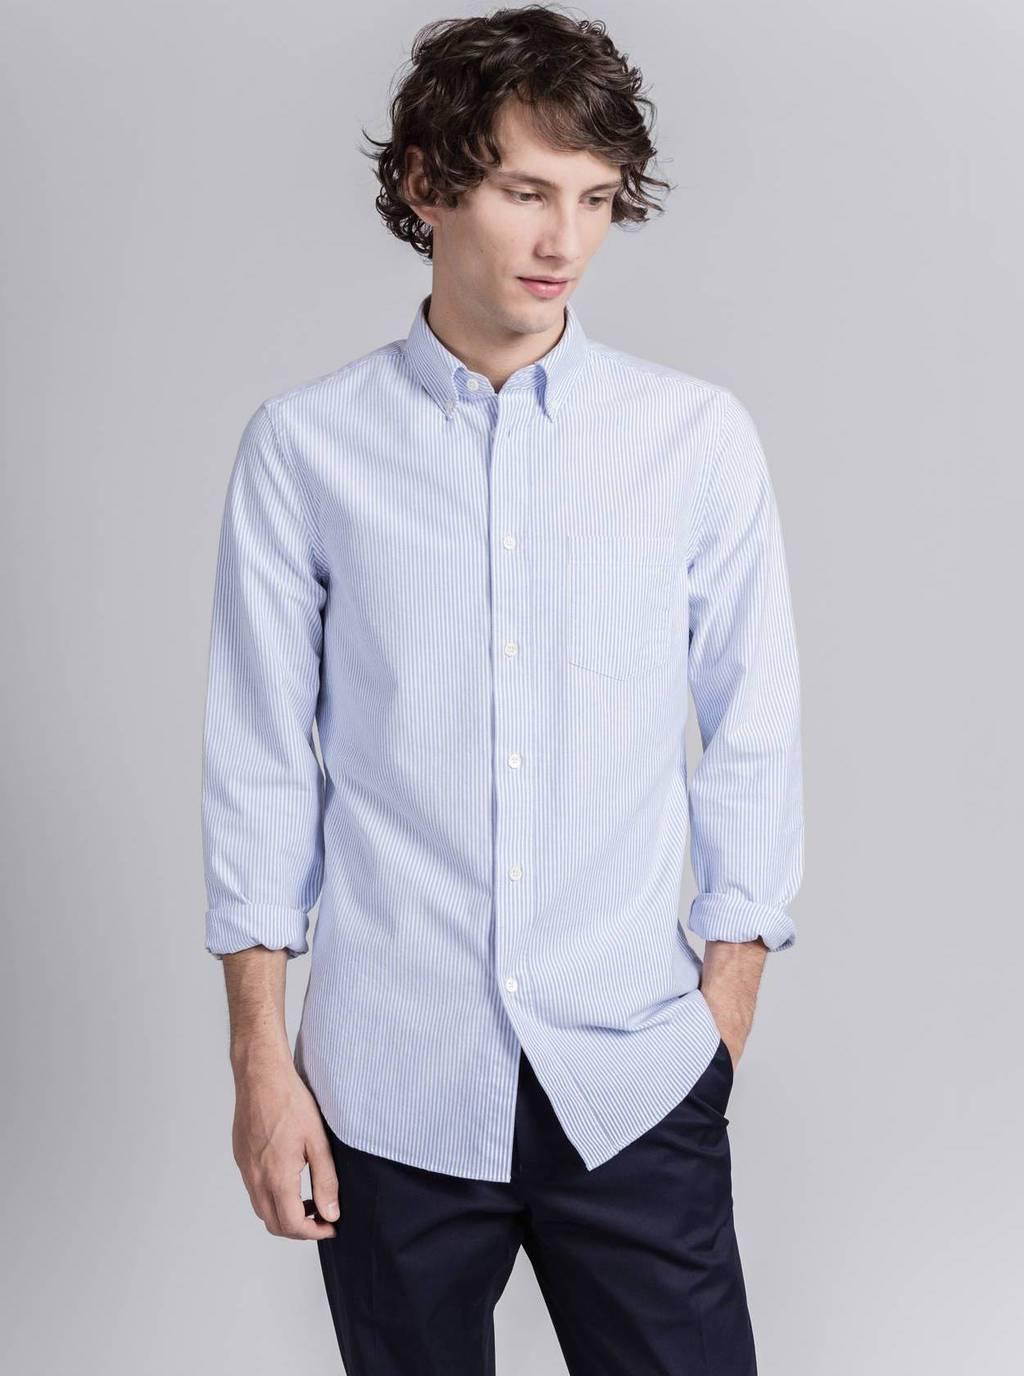 Asket Oxford Shirt Navy Stripe